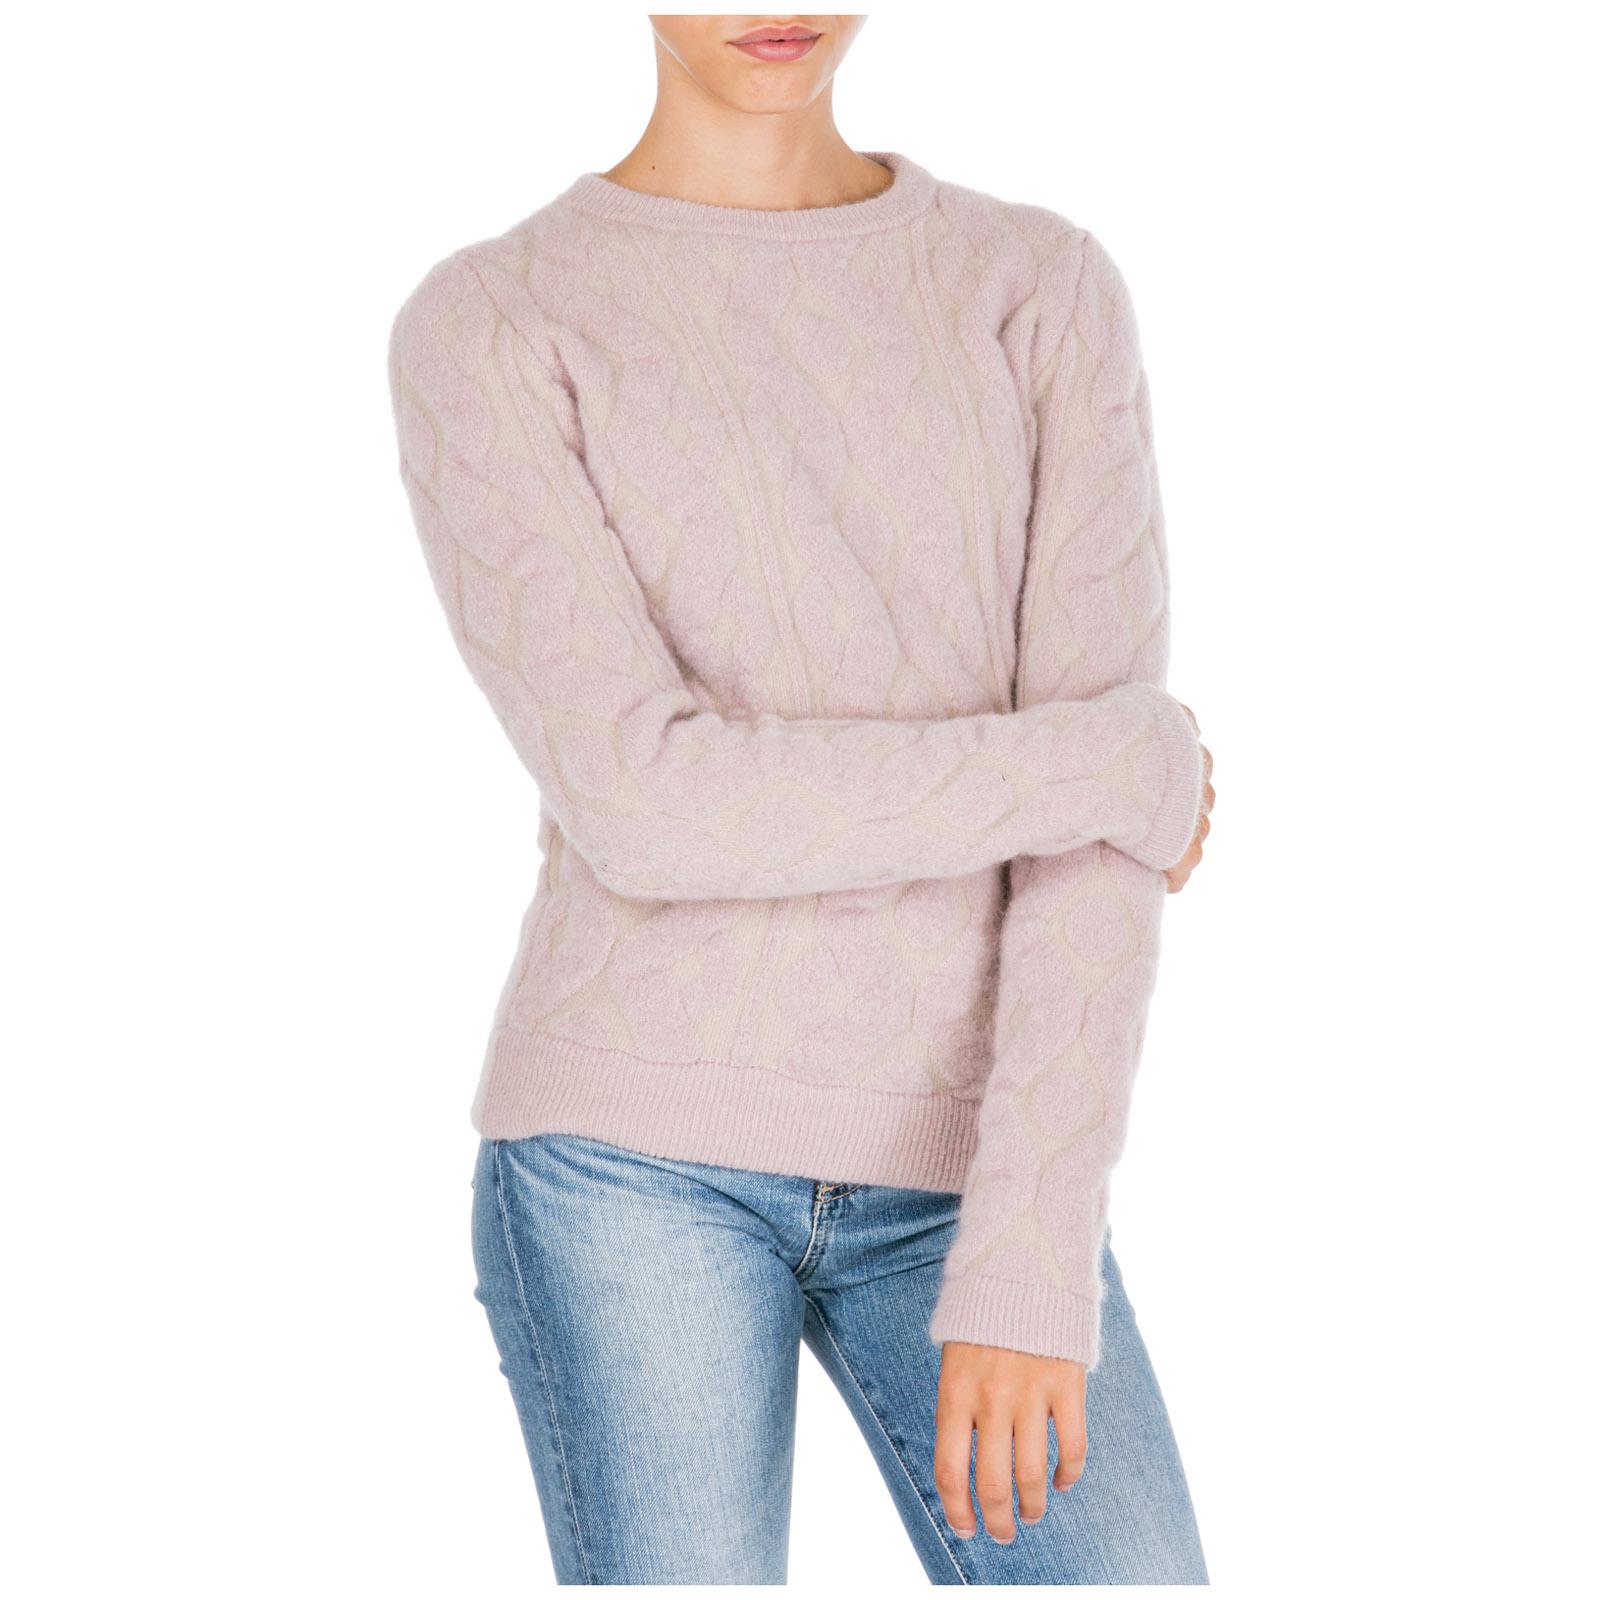 sale retailer 30321 6636d Damen pullover pulli rundhalsausschnitt